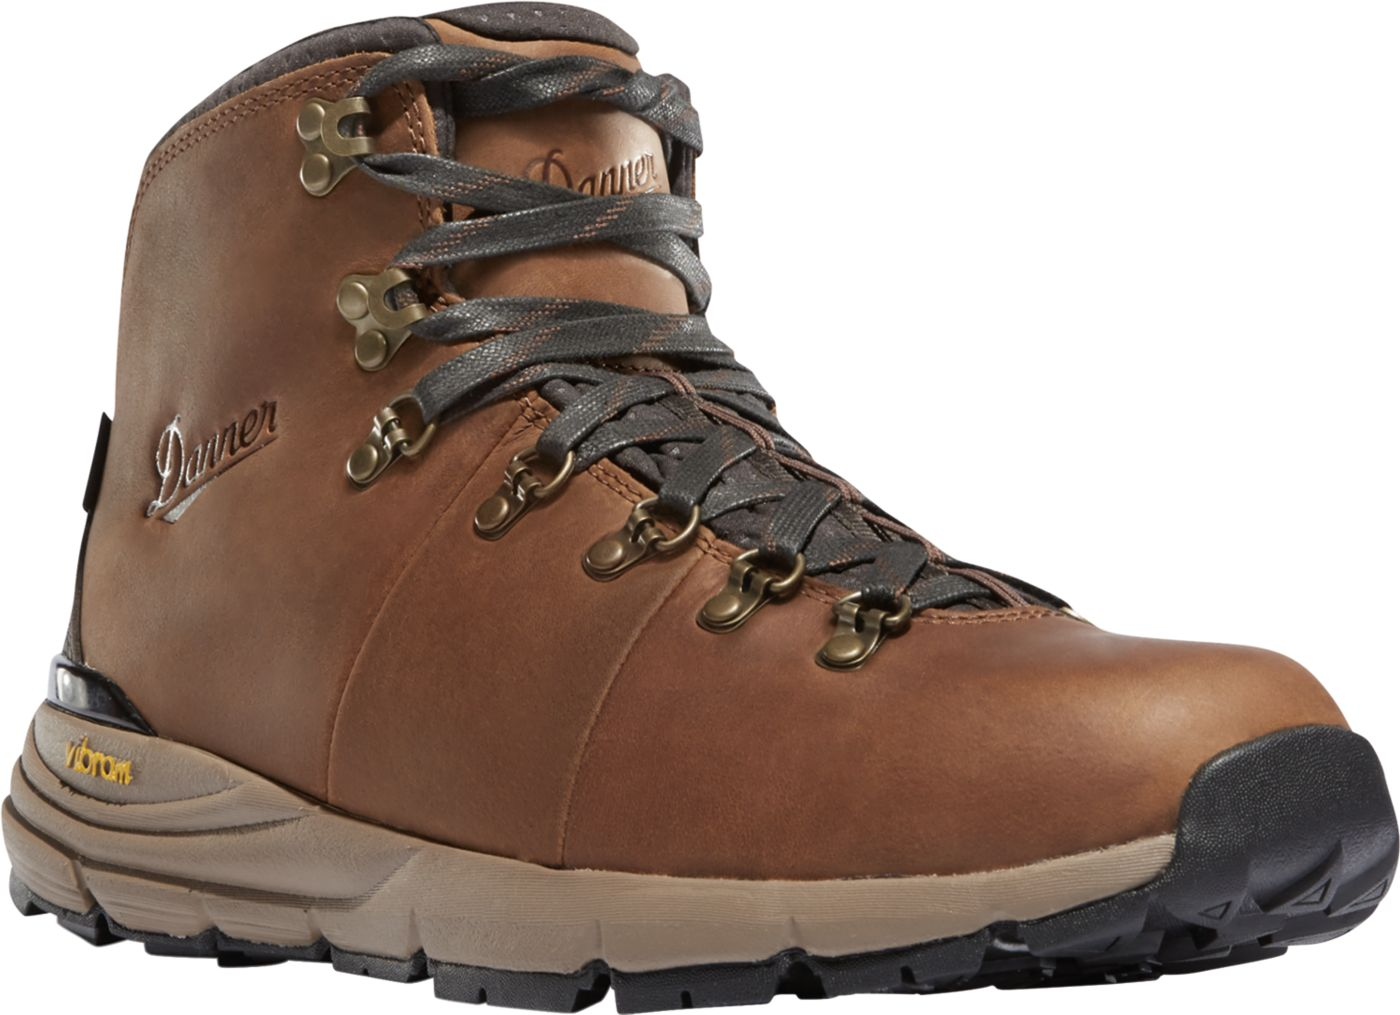 Danner Men's Mountain 600 4.5'' Leather Waterproof Hiking Boots